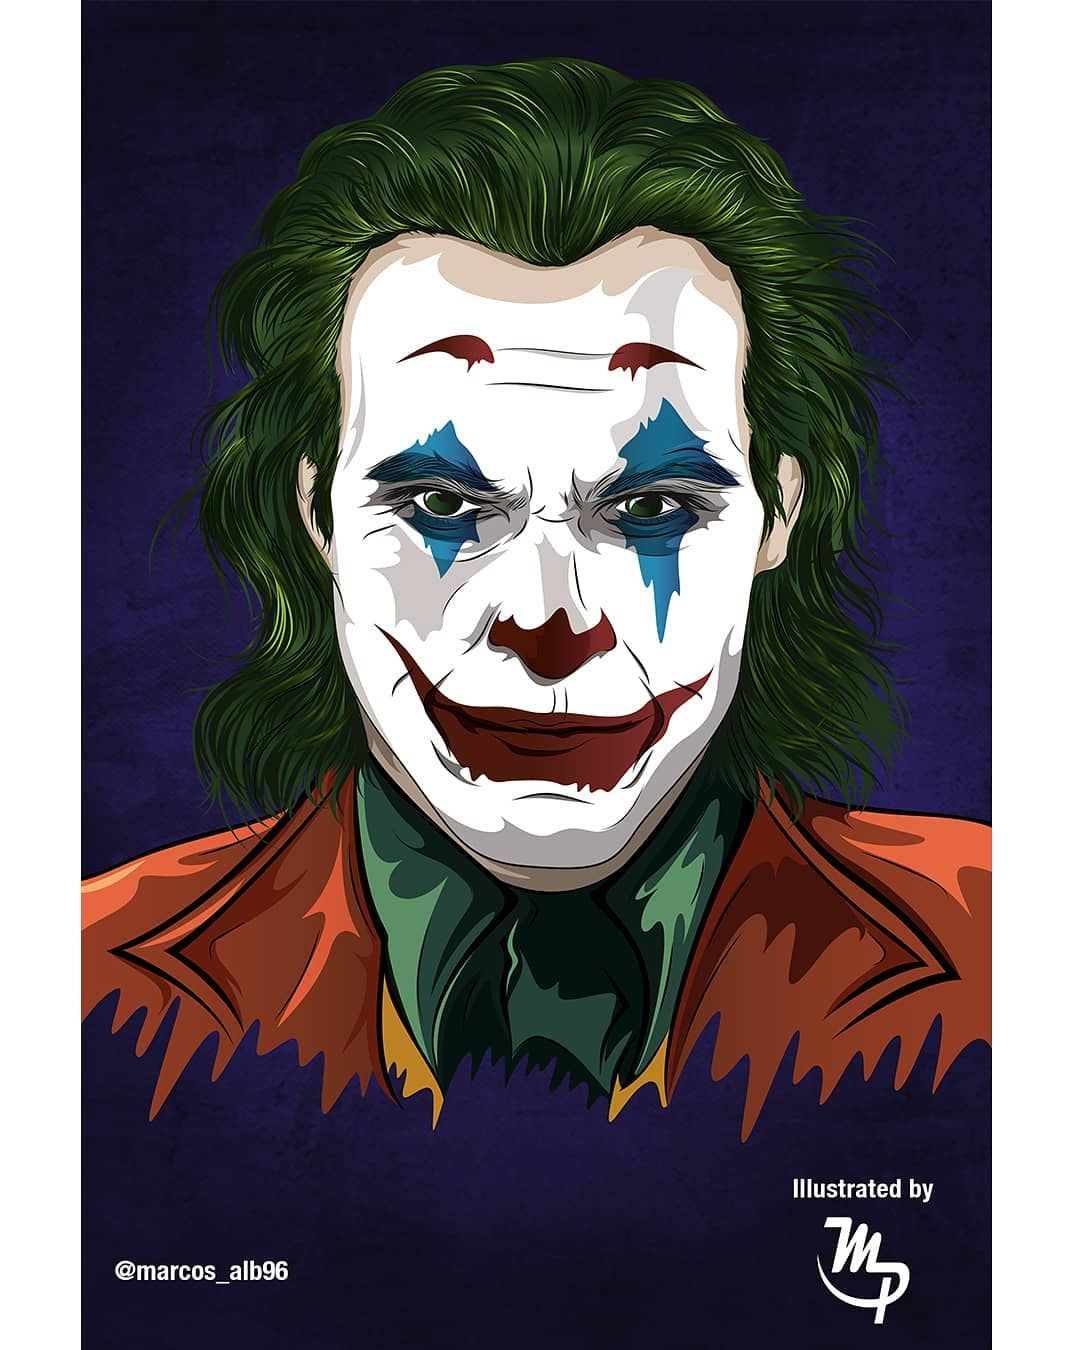 Marcoss Ilustrador On Instagram Joker 2019 La